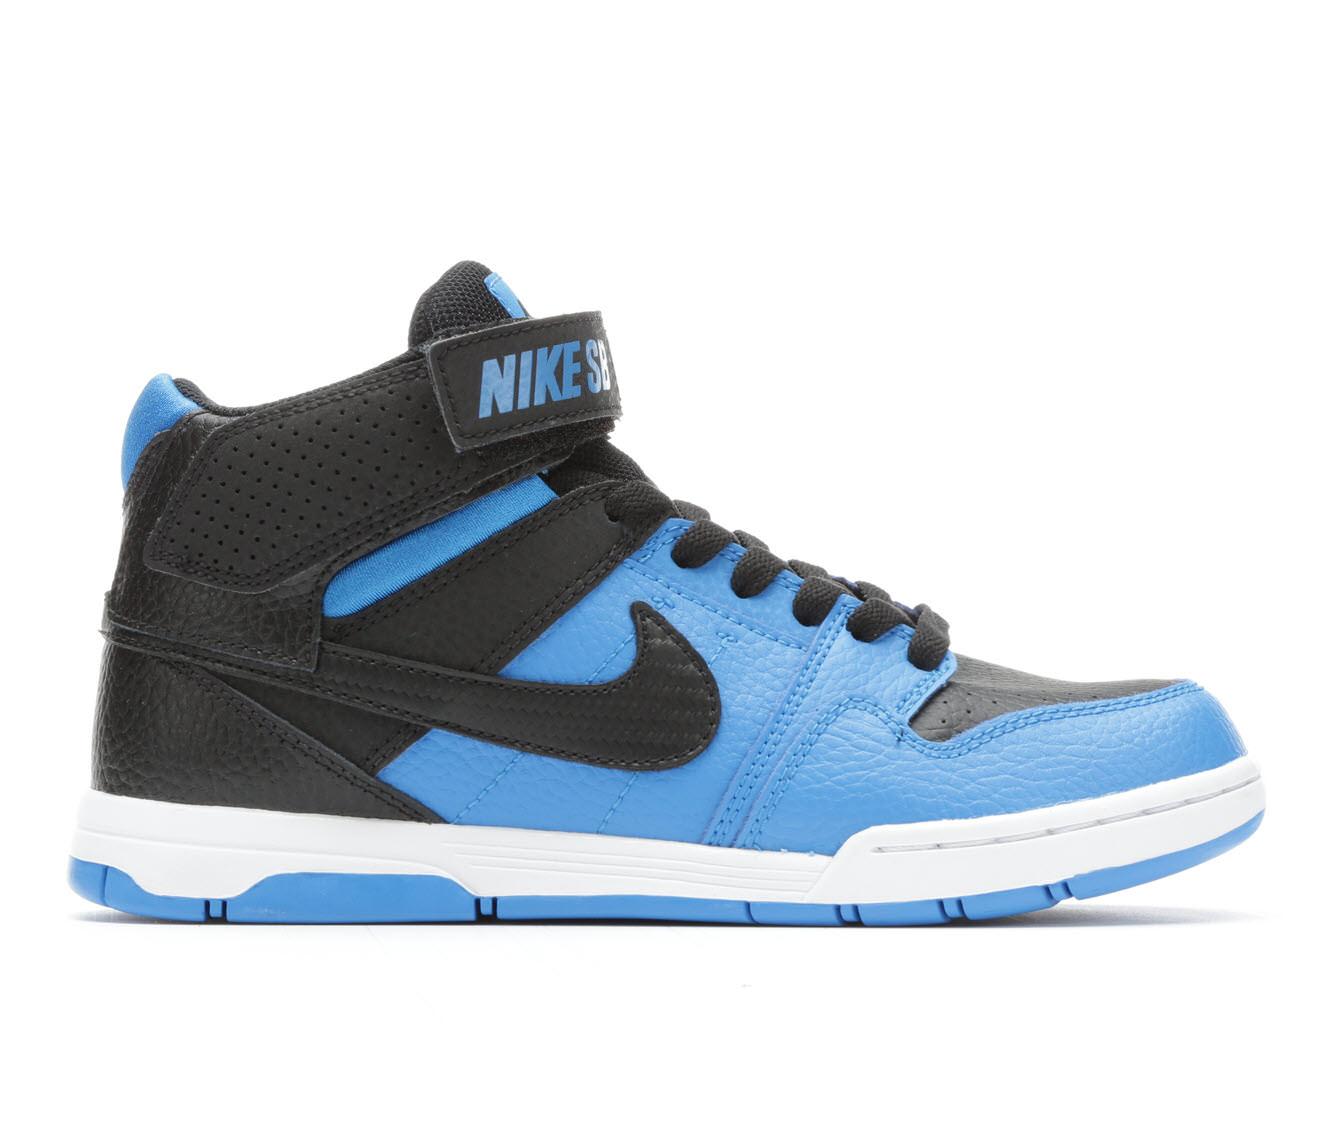 Boys' Nike Mogan Mid 2 Jr Skate Shoes (Blue)